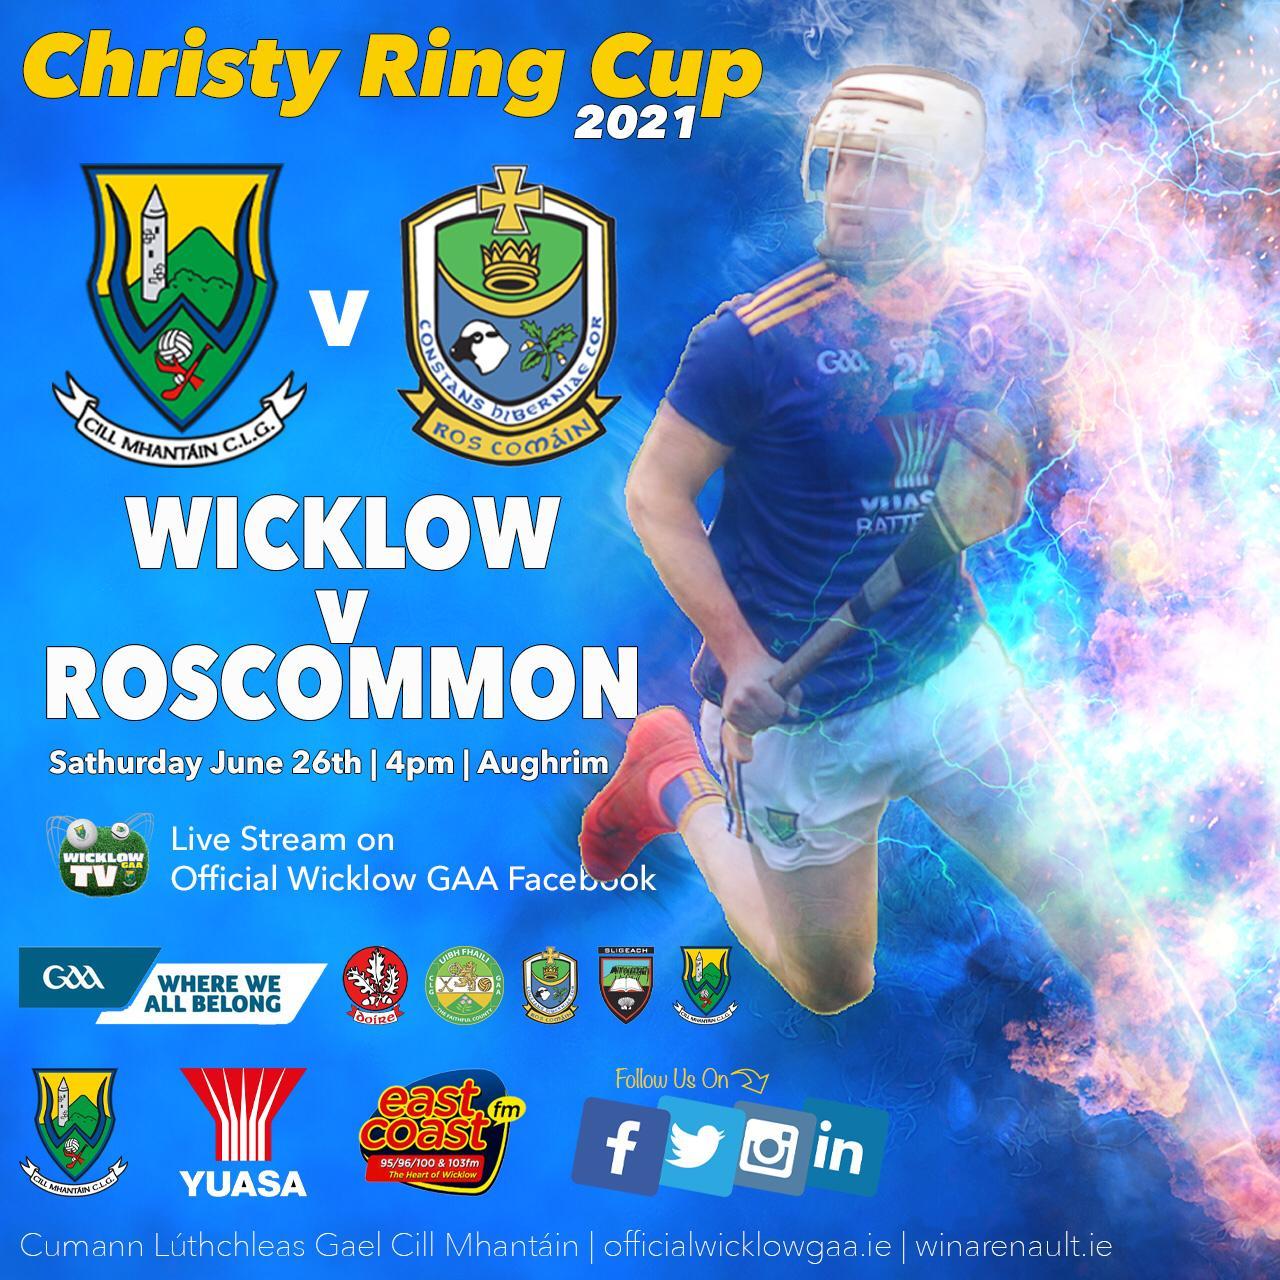 Christy Ring Wicklow v Roscommon programme